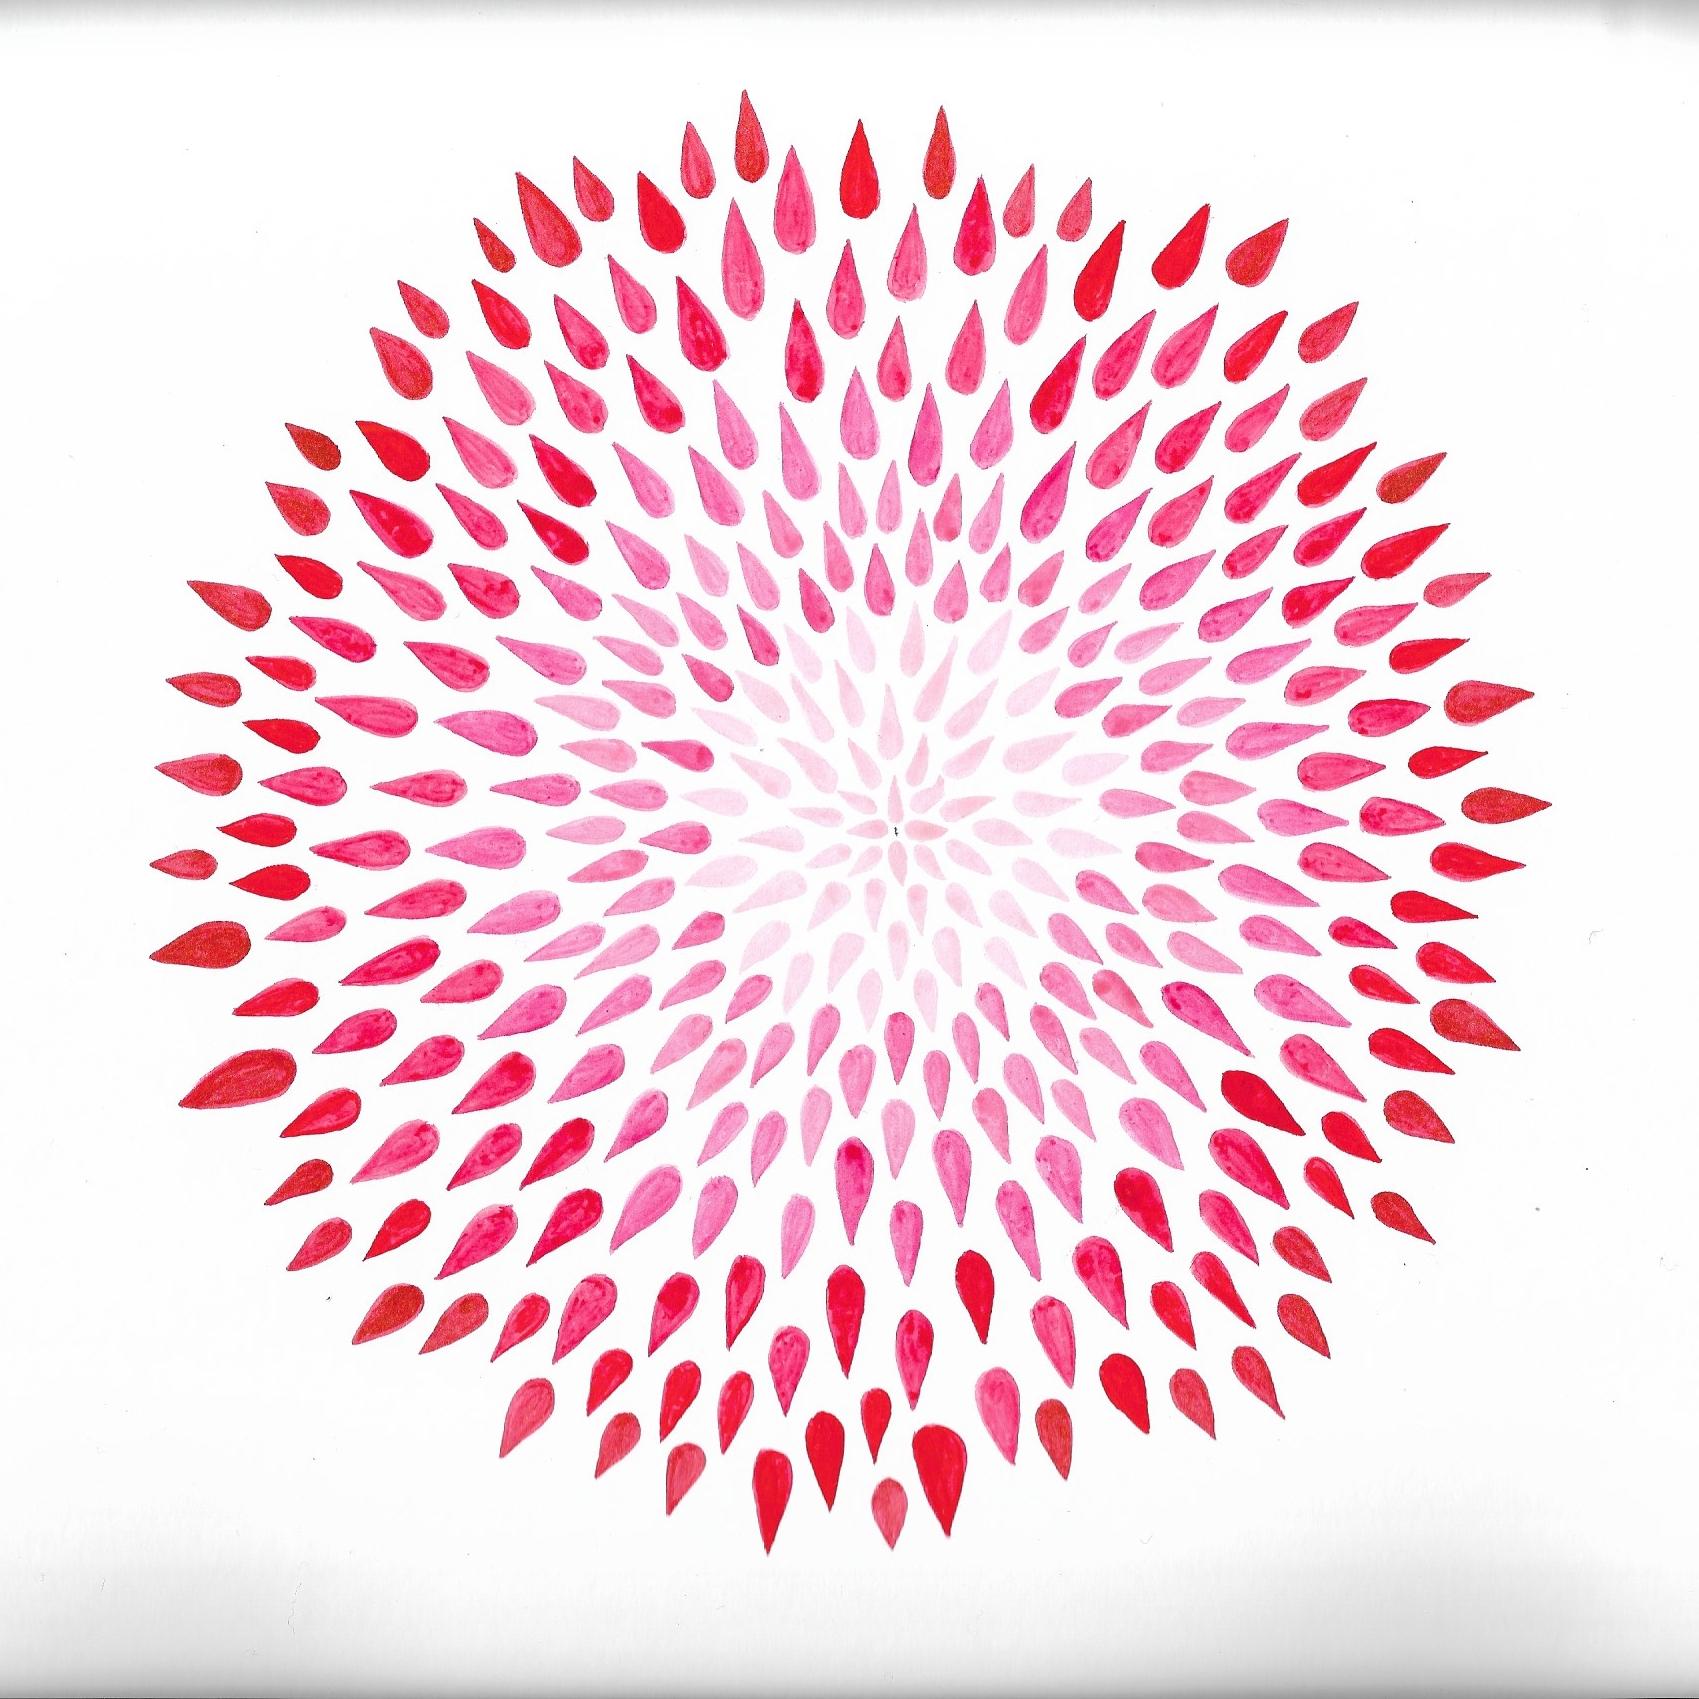 180128 Red Drops .jpg